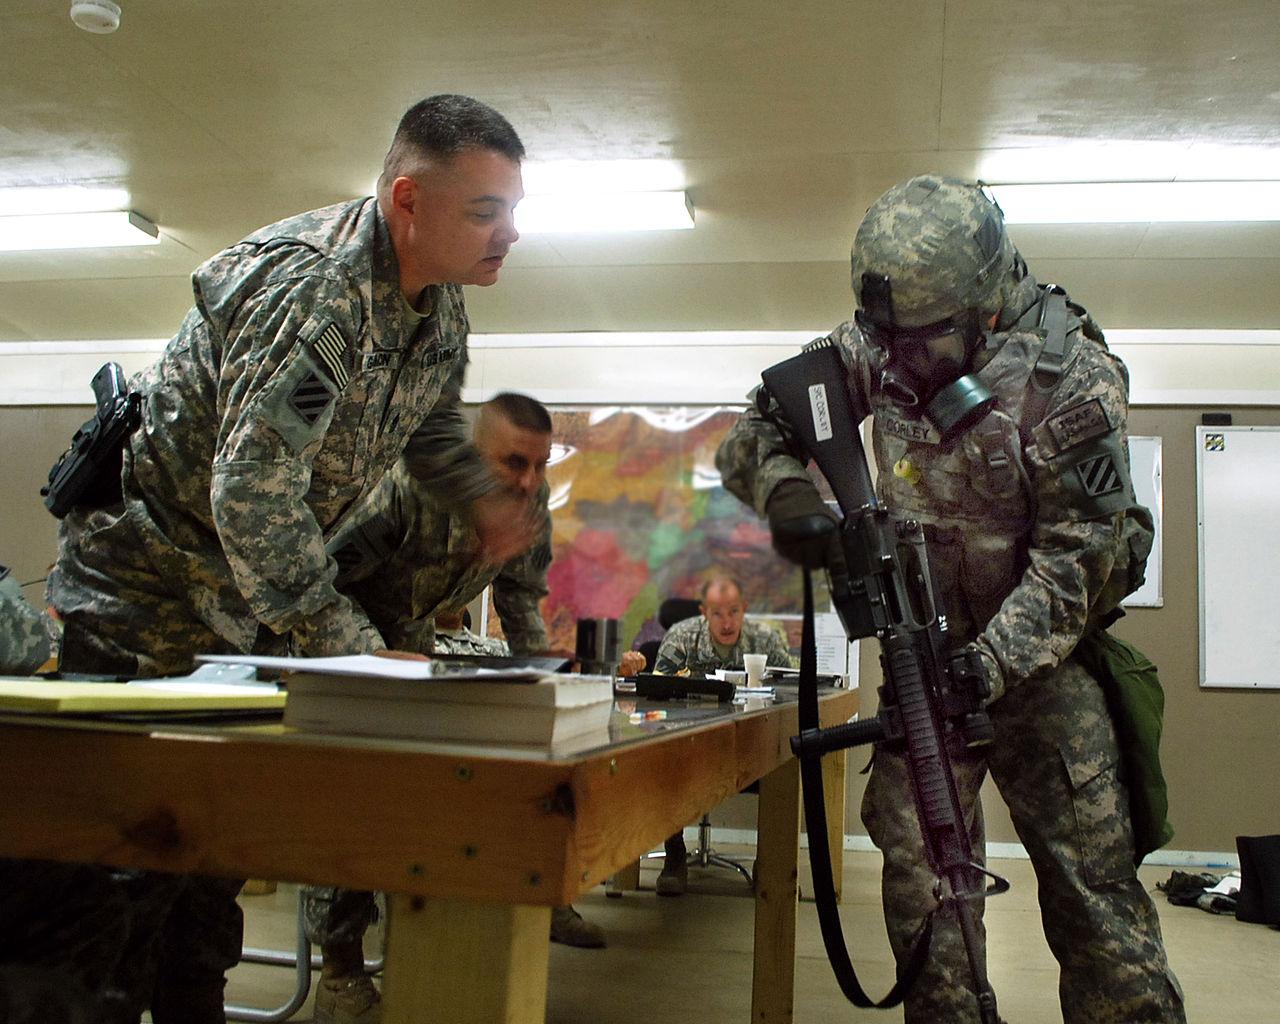 File:U.S. Army Spc. Jeremy Corley, right, with Bravo Company, 3rd ...